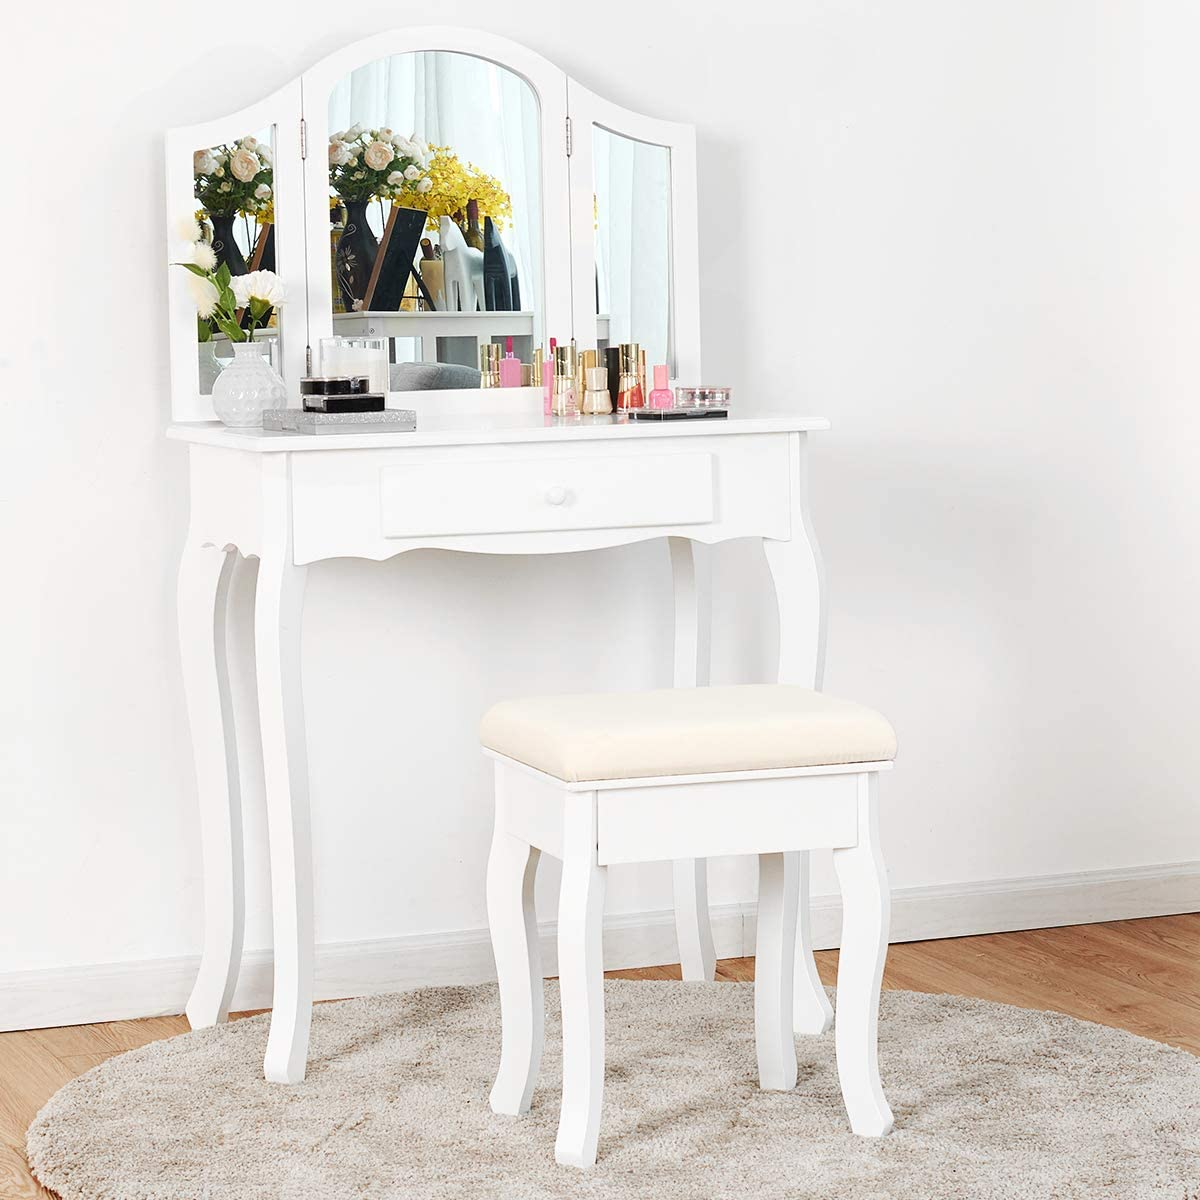 Modern Bathroom Bedroom Vanity Desk Wooden Makeup Table and Stool Set Black Women Girls Kids Vanity Set Giantex Vanity Set with Tri-Folding Mirror and Cushioned Stool